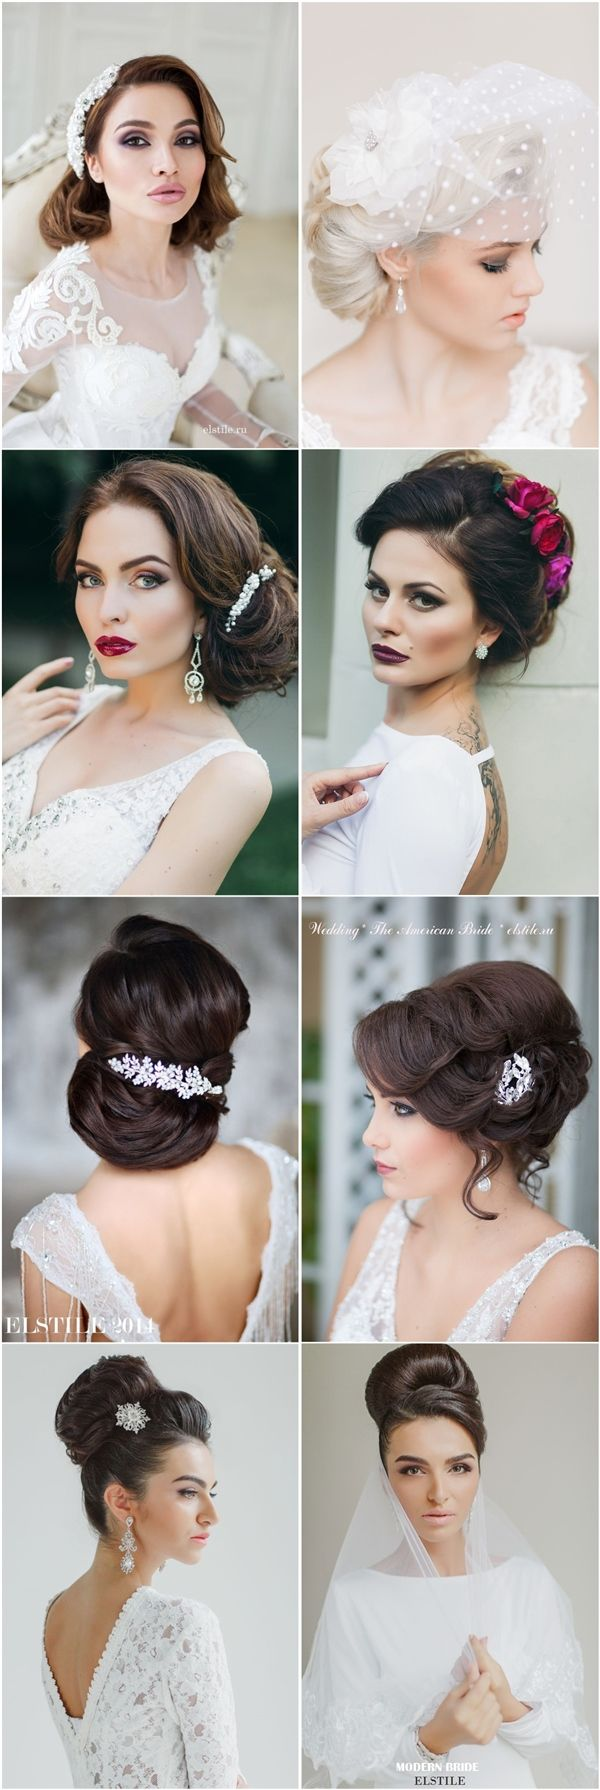 Vintage Retro Wedding Hairstyles And Retro Wedding Updos Jpg 600 1790 Retro Wedding Hair Vintage Wedding Hair Vintage Hairstyles